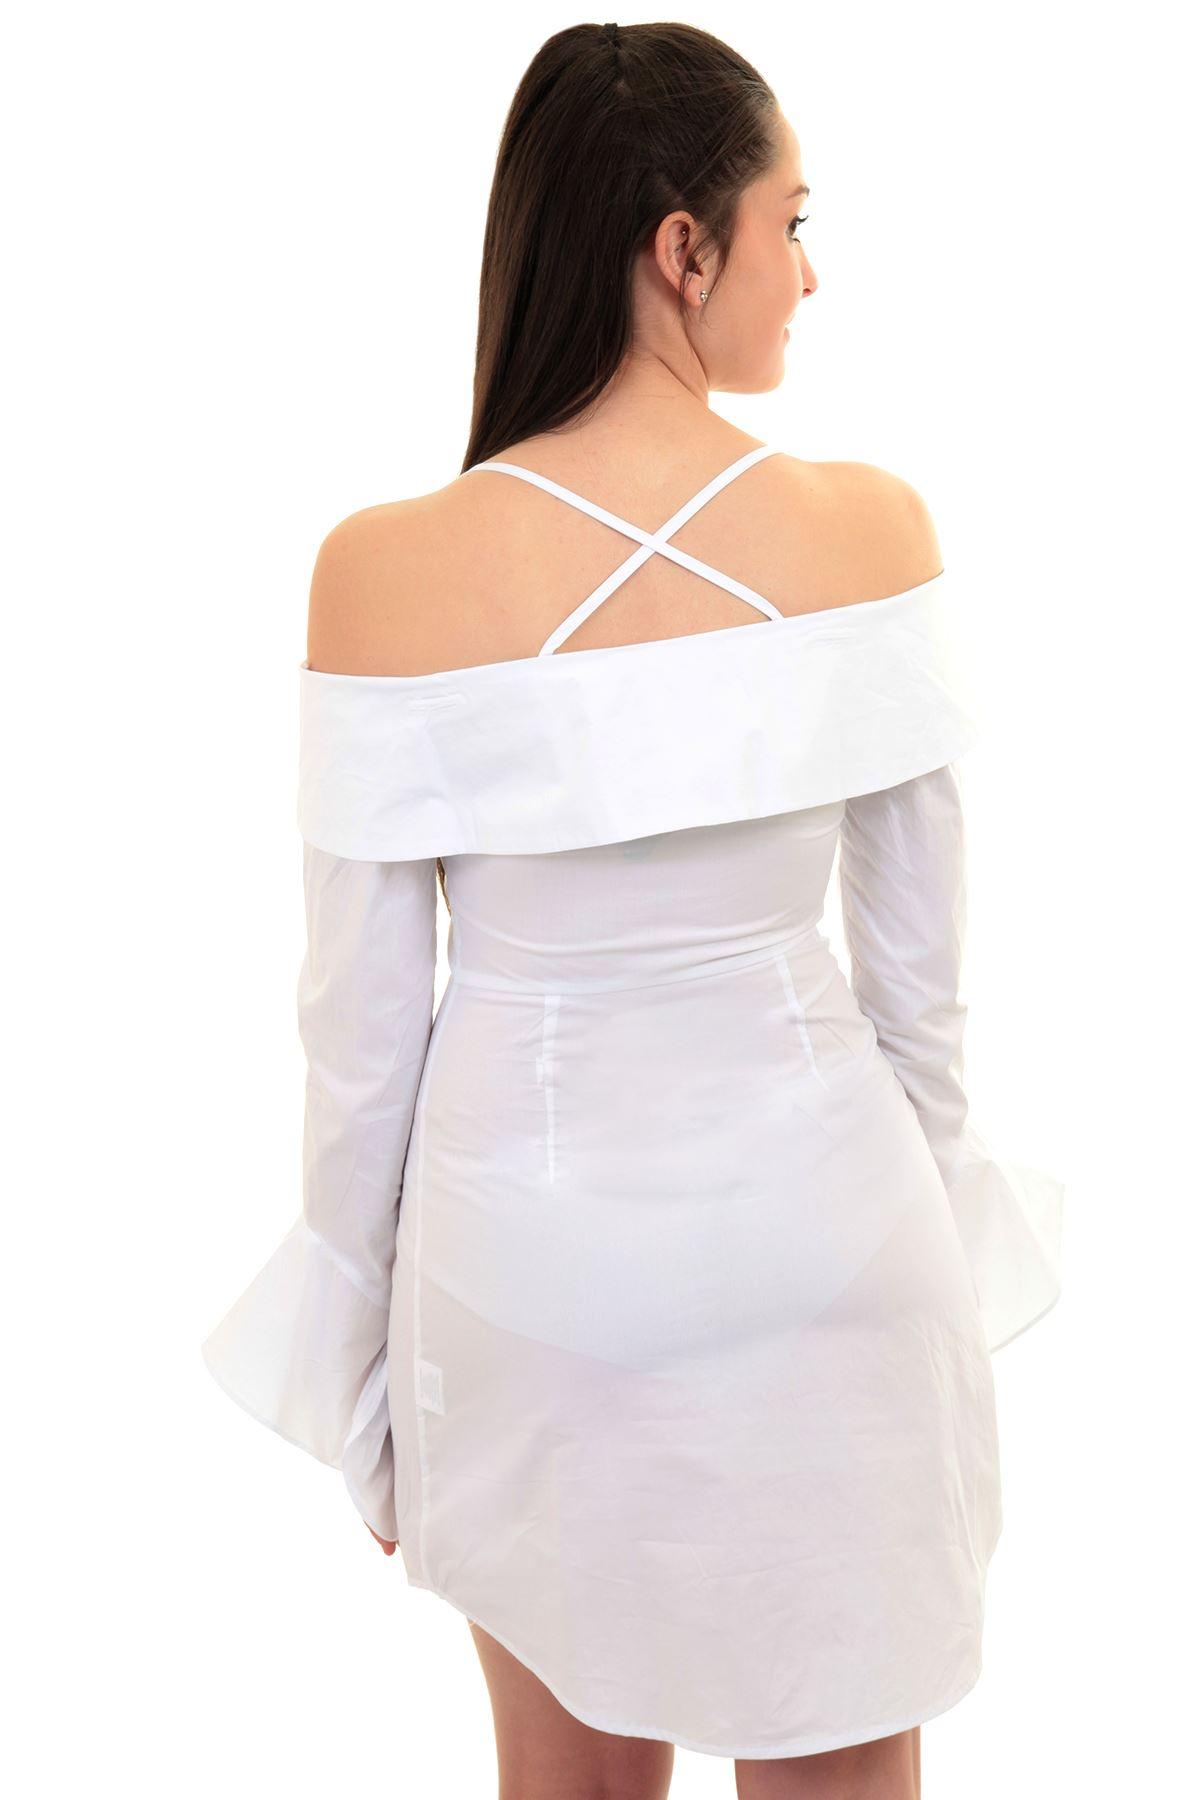 7a10d974a4ea Womens Off Shoulder Bardot Frill Bell Sleeve Long Blouse Button Up ...